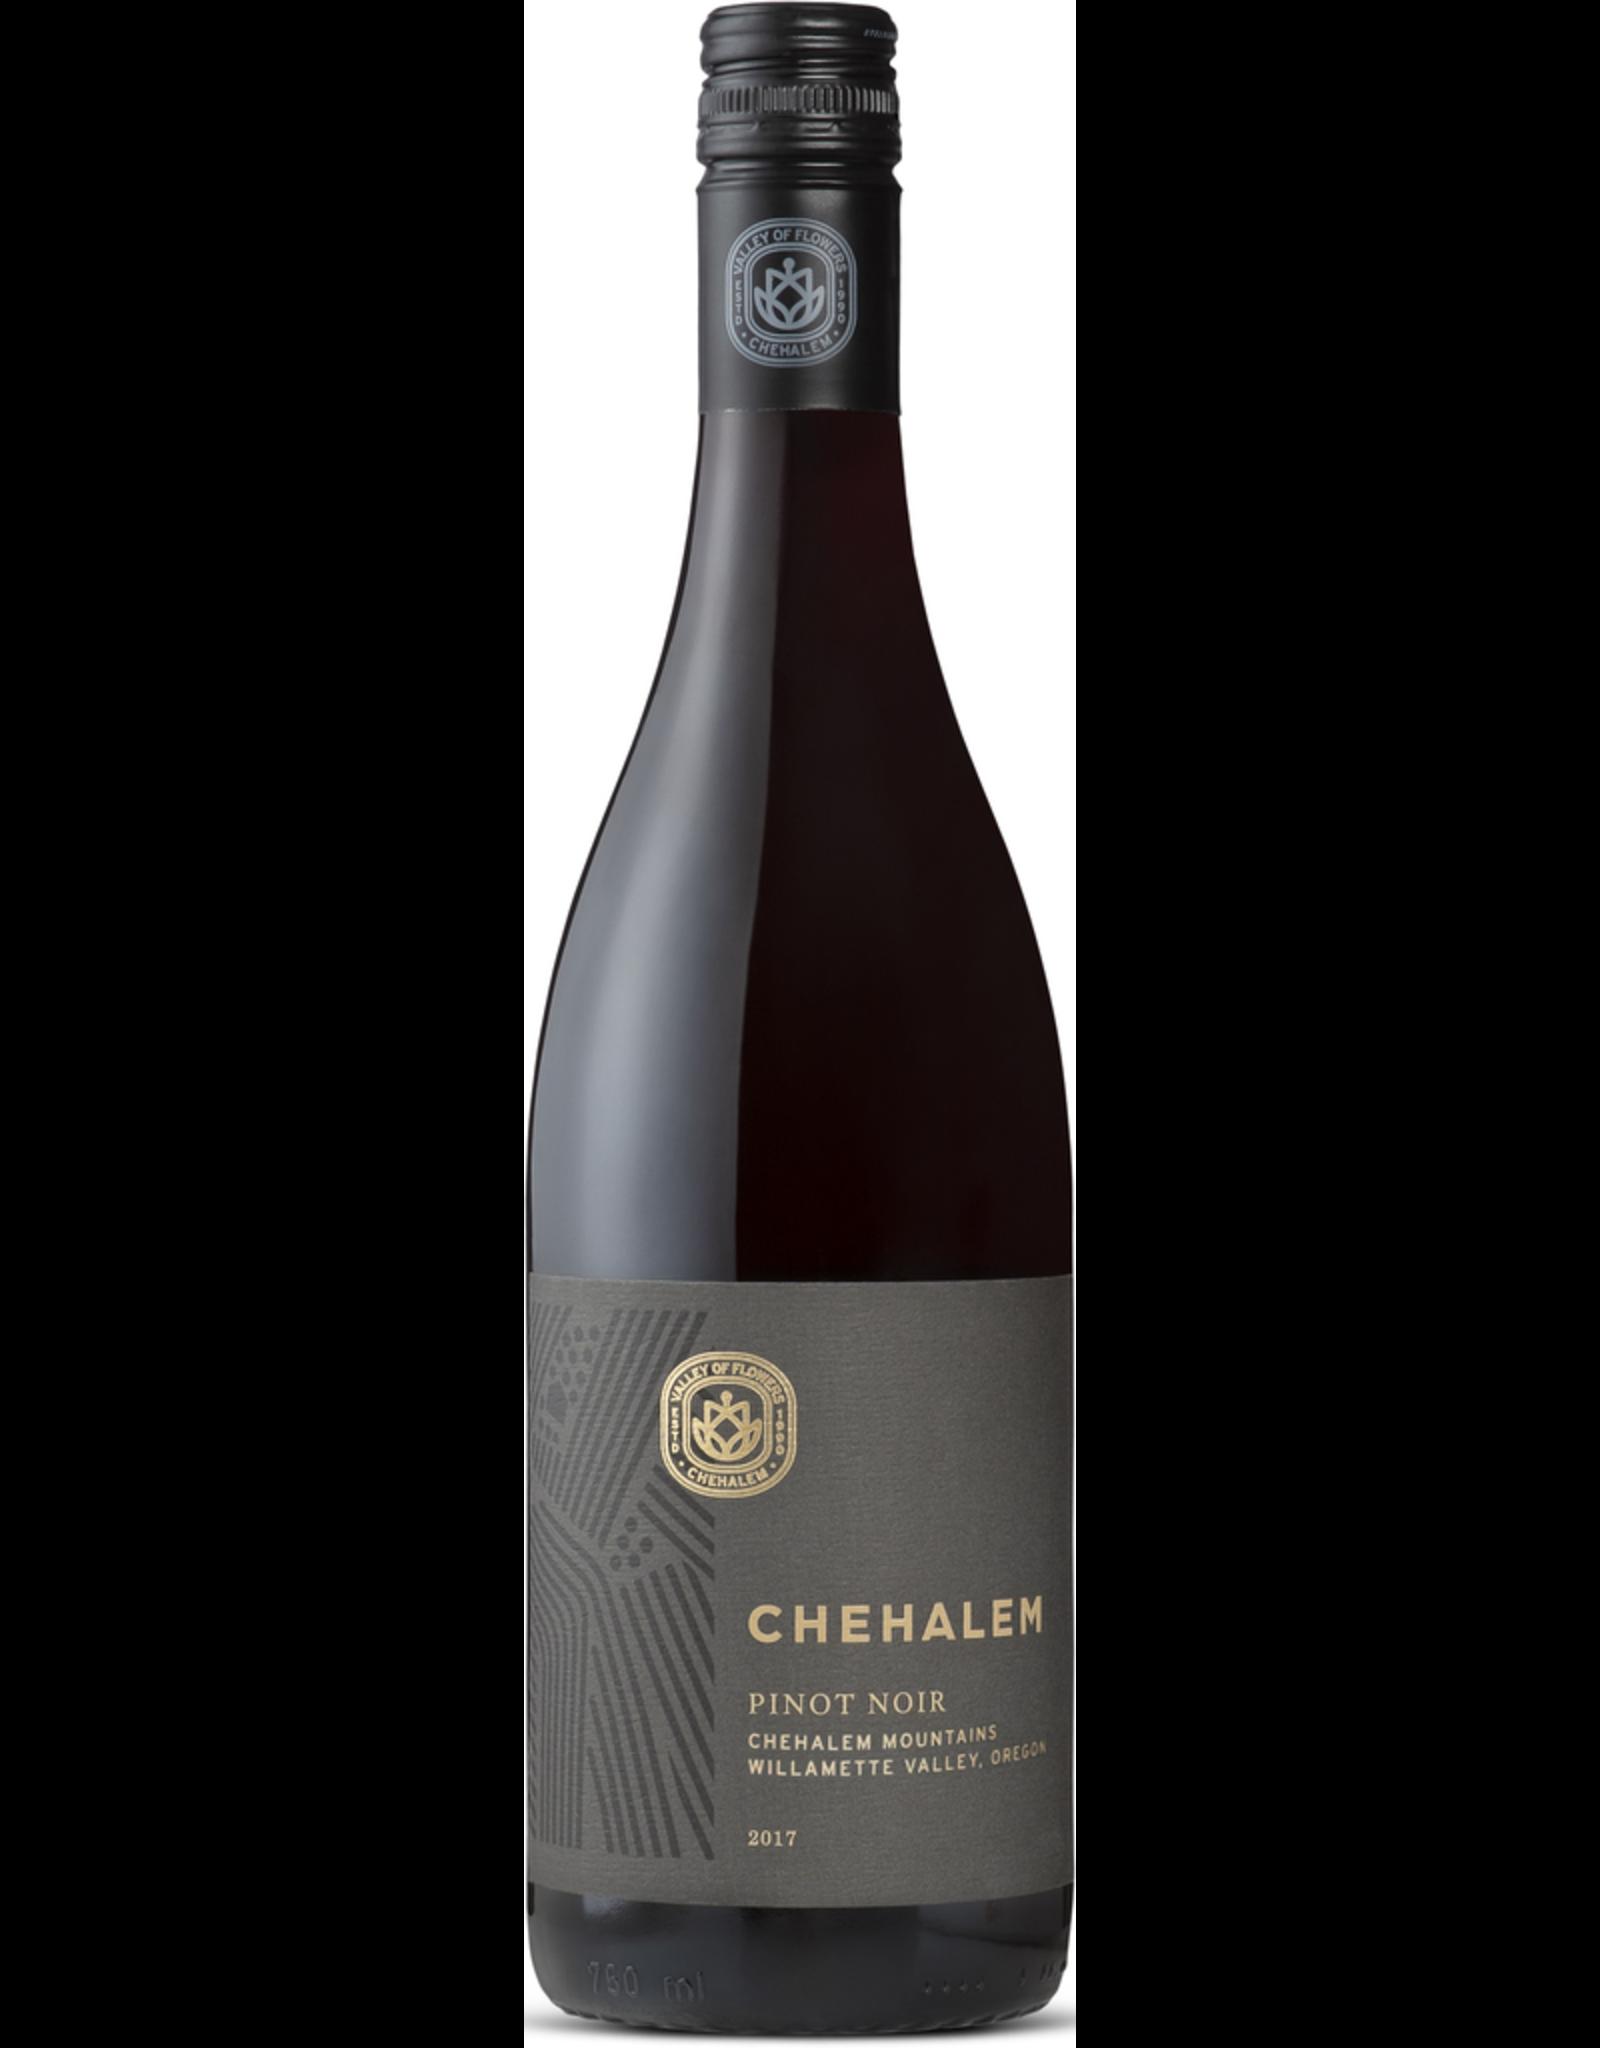 Red Wine 2018, Chehalem Mountains, Pinot Noir, Chehalem, Willamette Valley, Oregon, 13.5% Alc, CT91, TW92